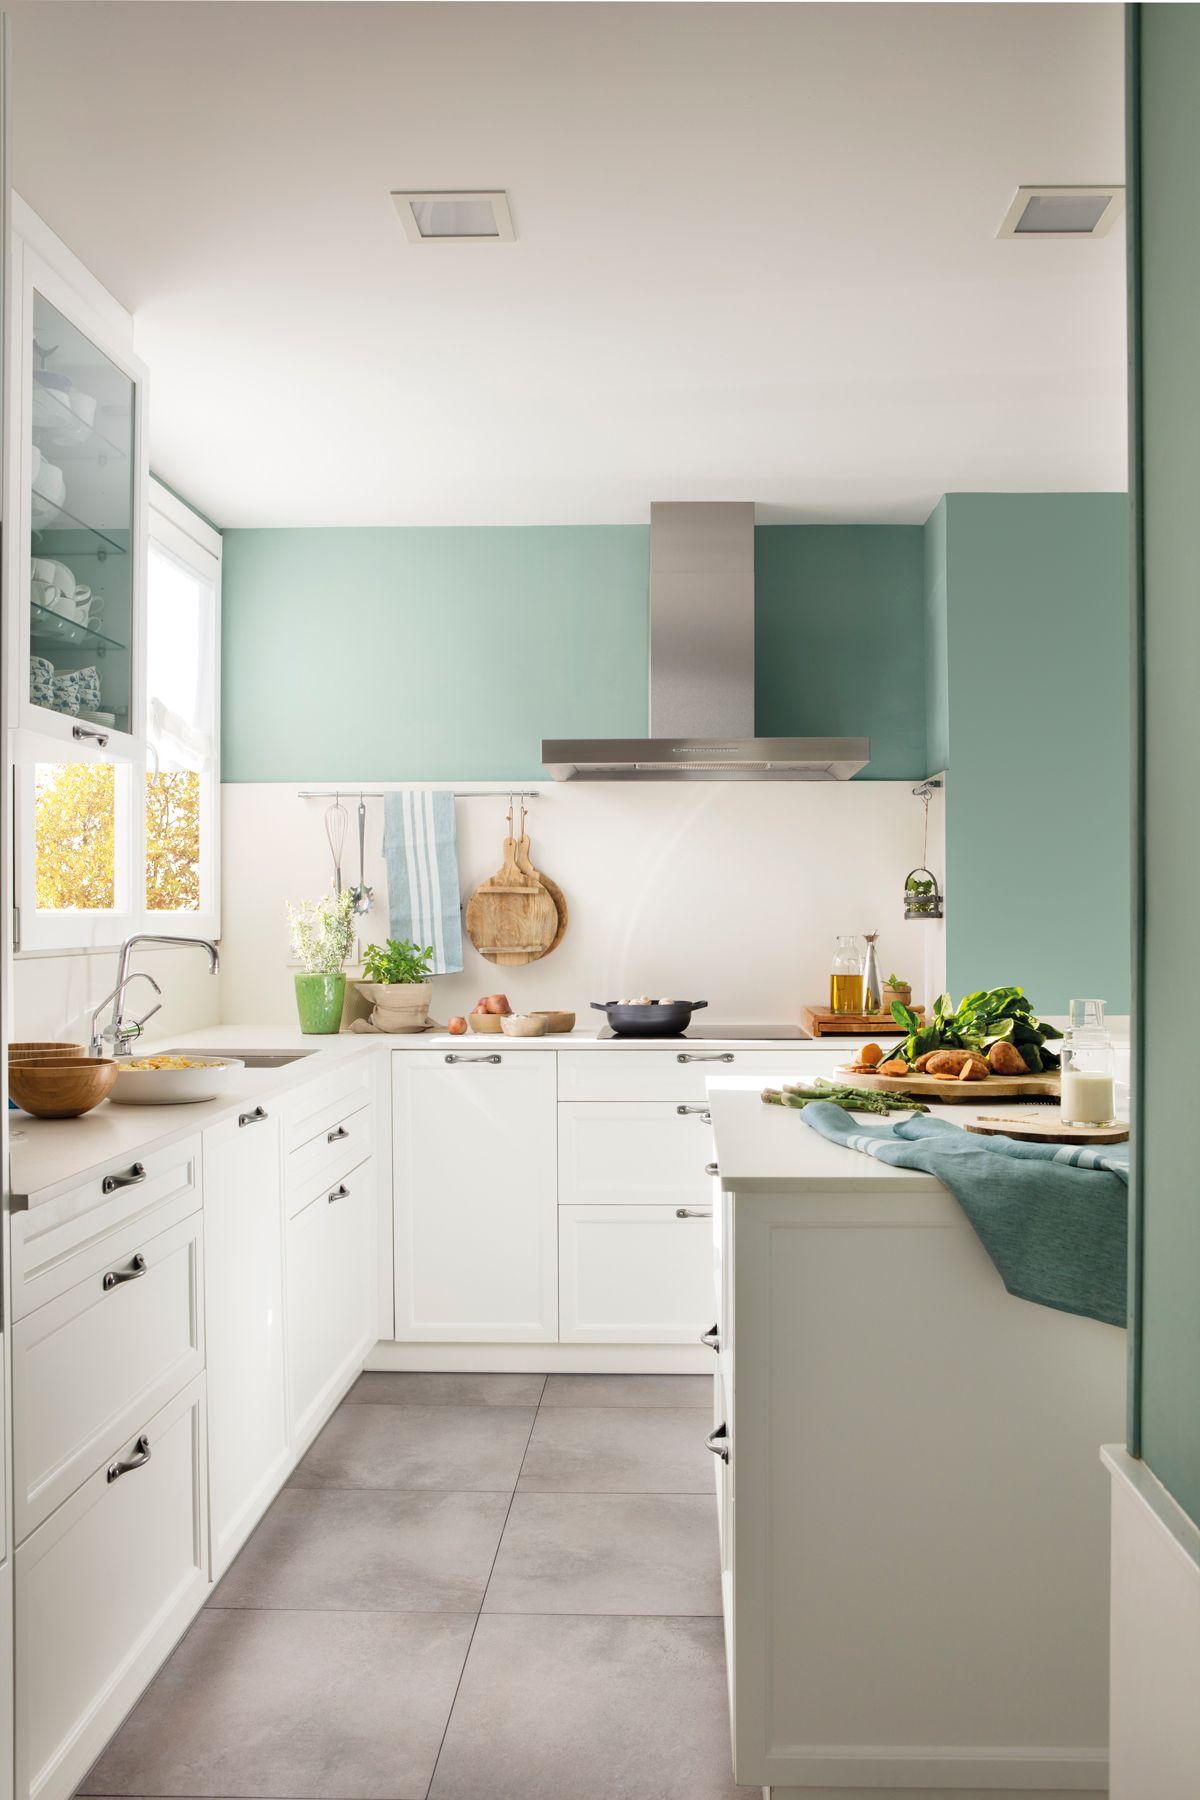 Muebles de cocina - ElMueble | Paredes pintadas de verde, Cocina ...